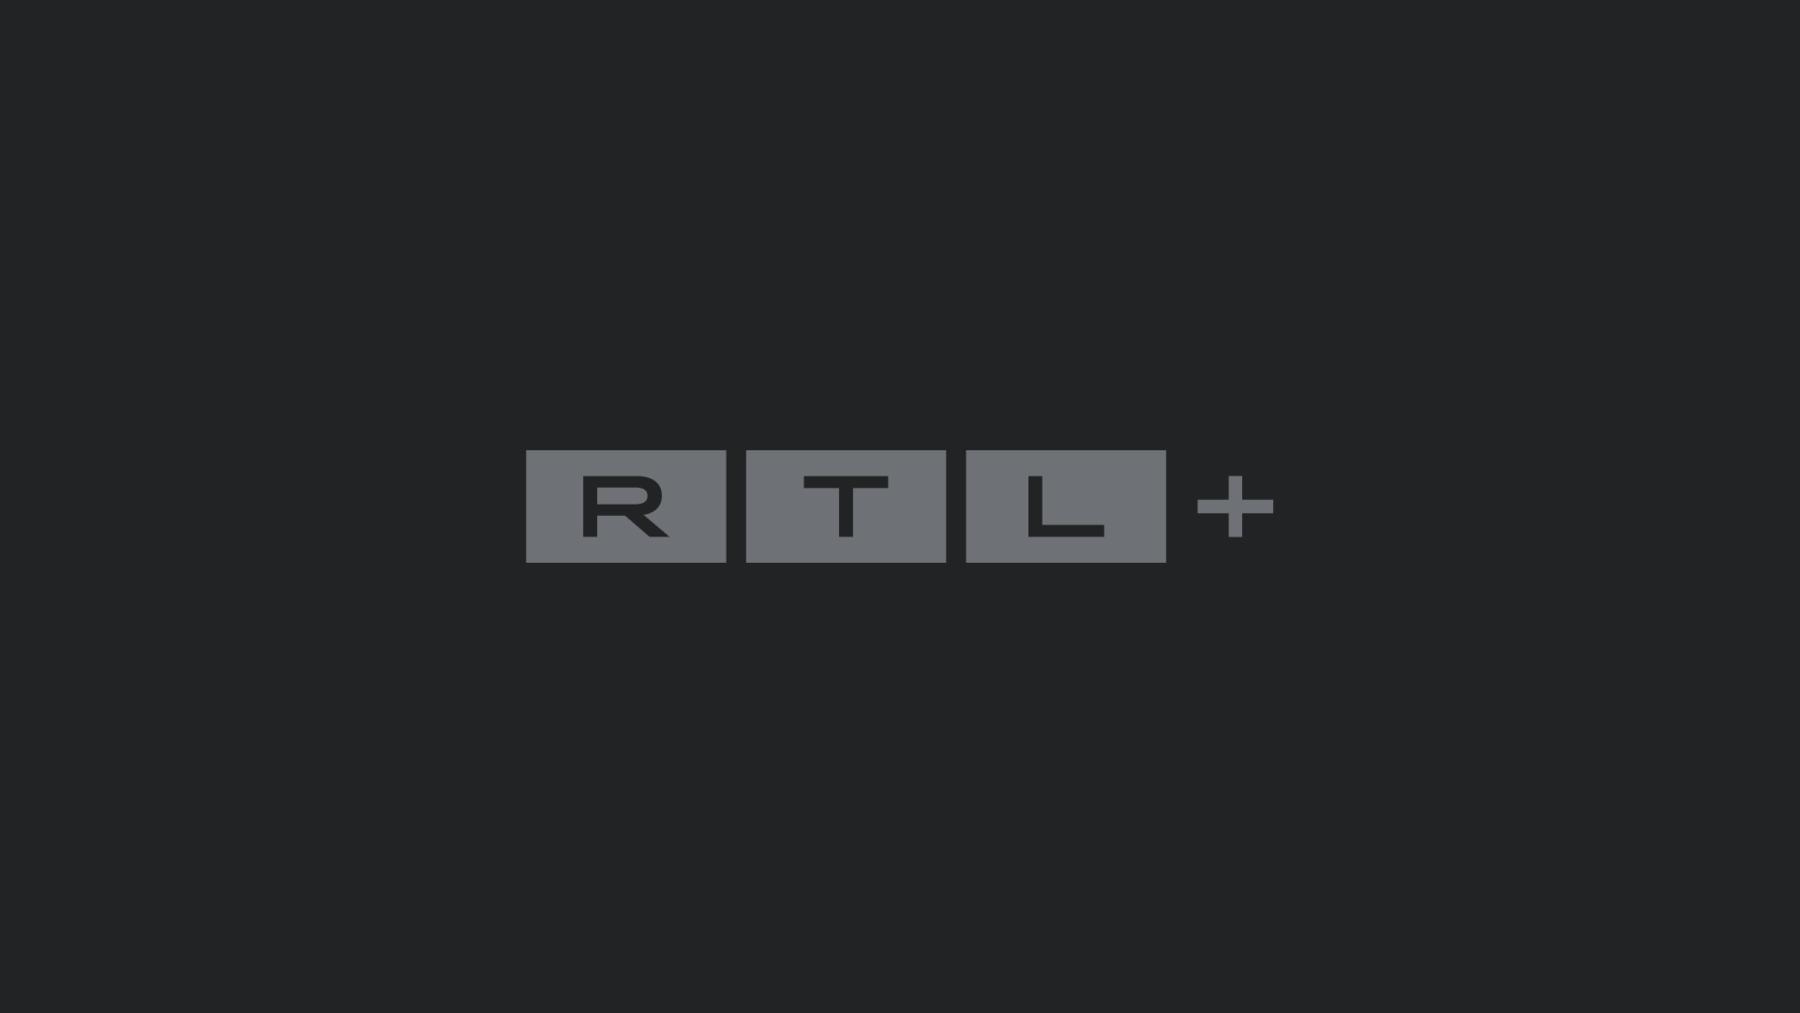 Trailer: Eric gegen Stehfest - In Therapie